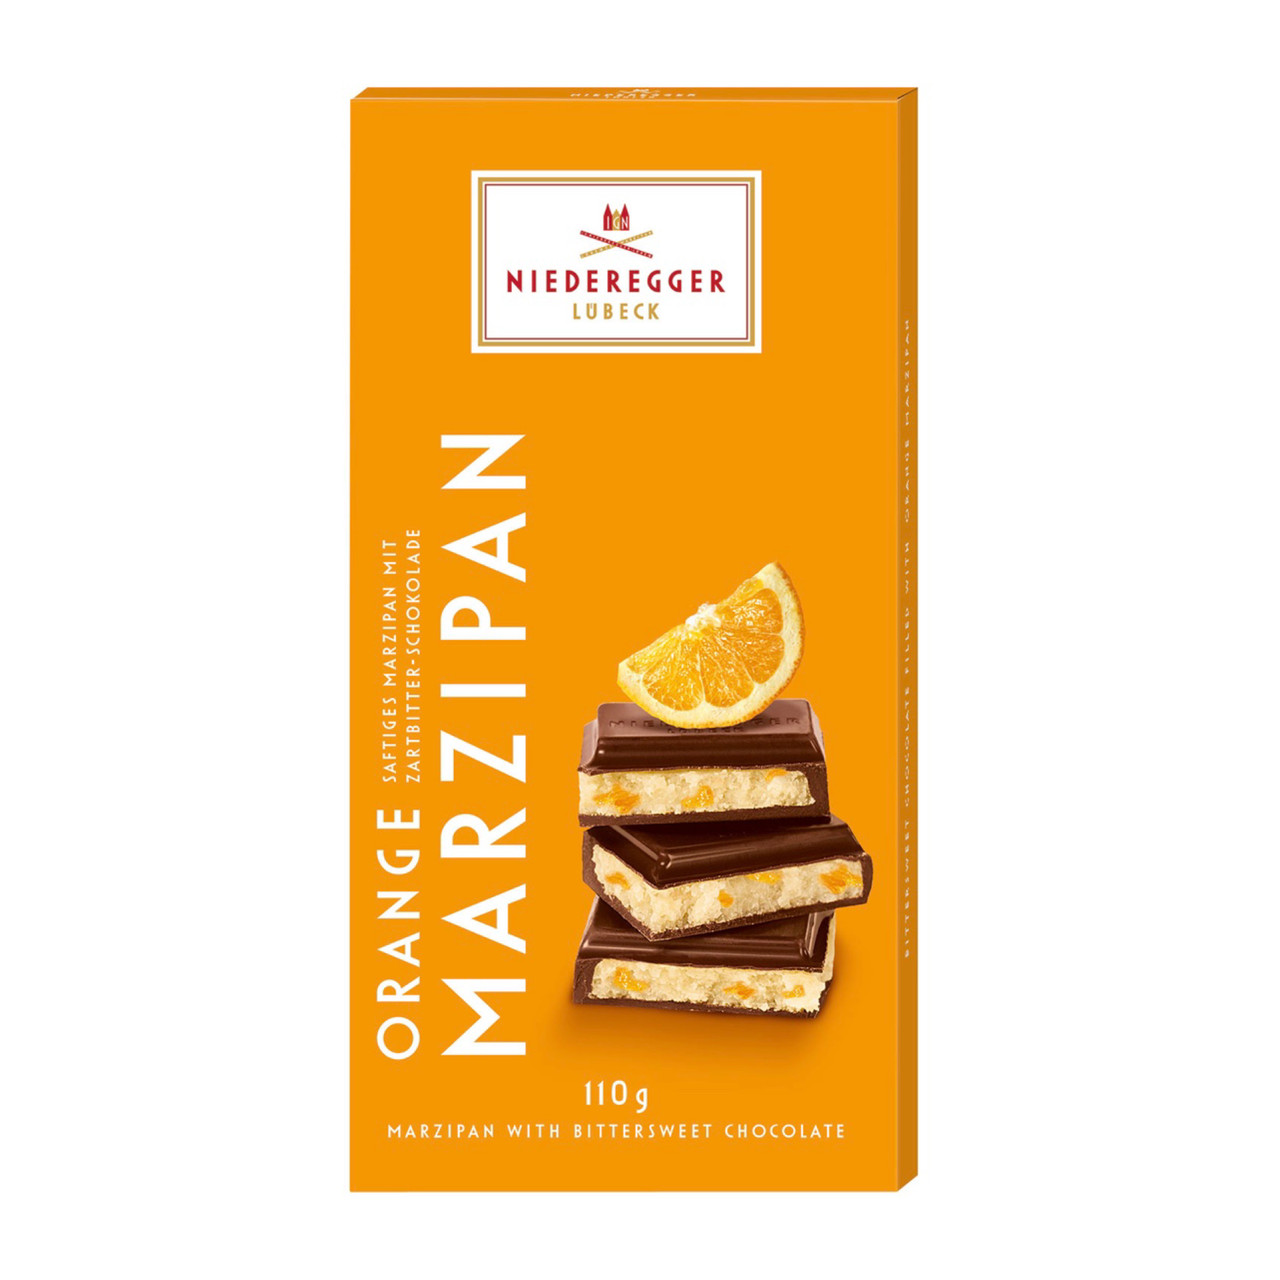 Niederegger Марципан с апельсином в чёрном шоколаде